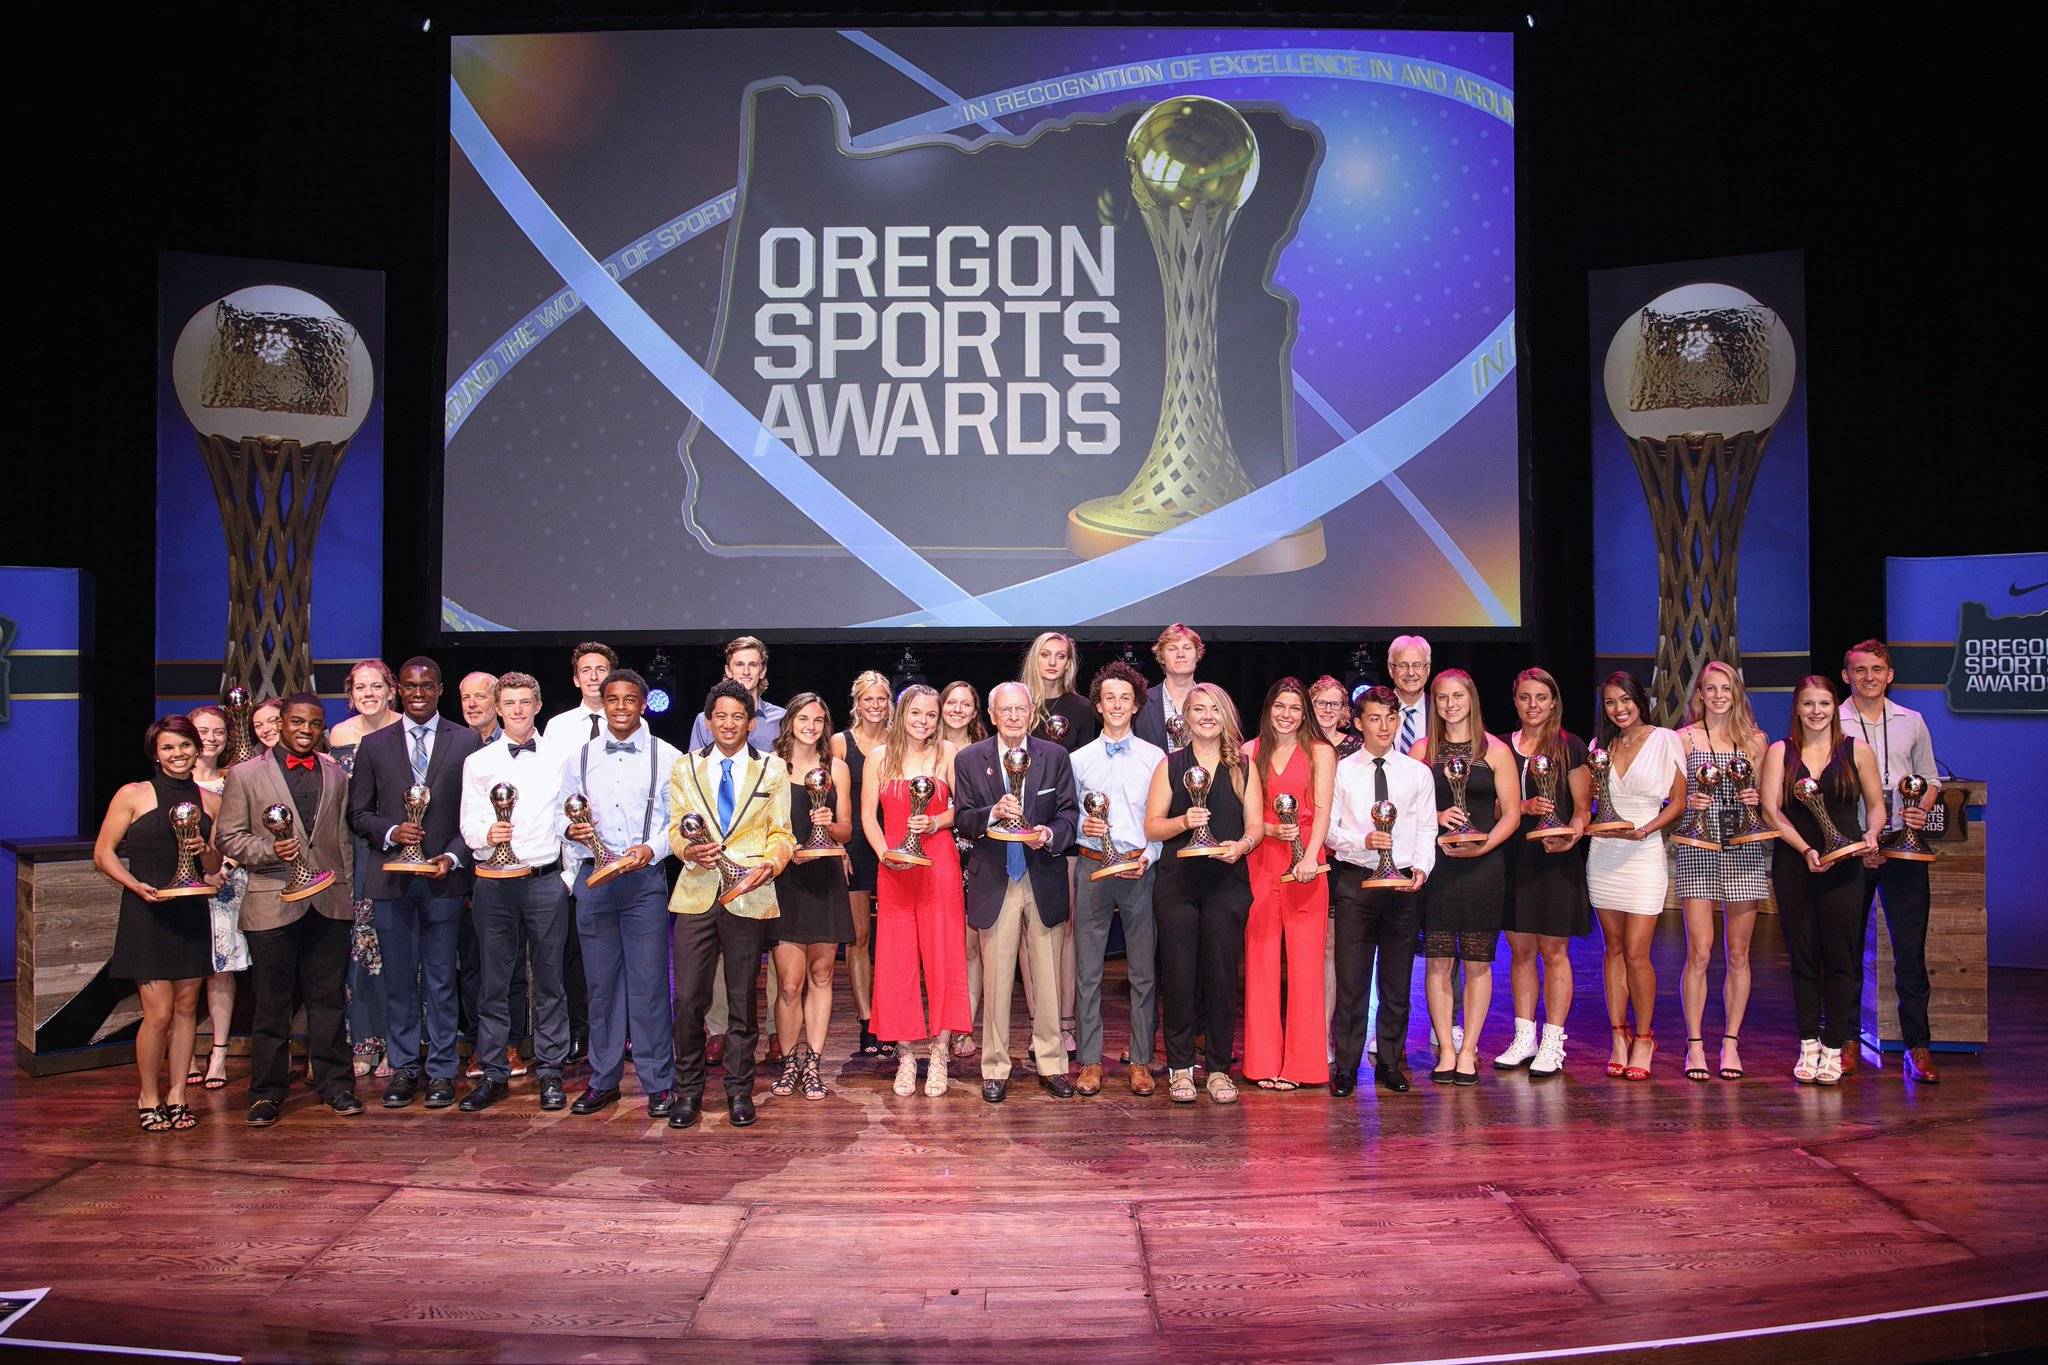 2018 award winners. Notable names include Damian Lillard (Portland Trail Blazers), Diego Valeri (Portland Timbers), Mark Parsons (Portland Thorns), Sabrina Ionescu (Oregon Ducks), Nick Madrigal (Oregon State Beavers), Cameron Brink (Southridge High), Micah Williams (Benson High) and Marcus Tsohonis (Jefferson High).